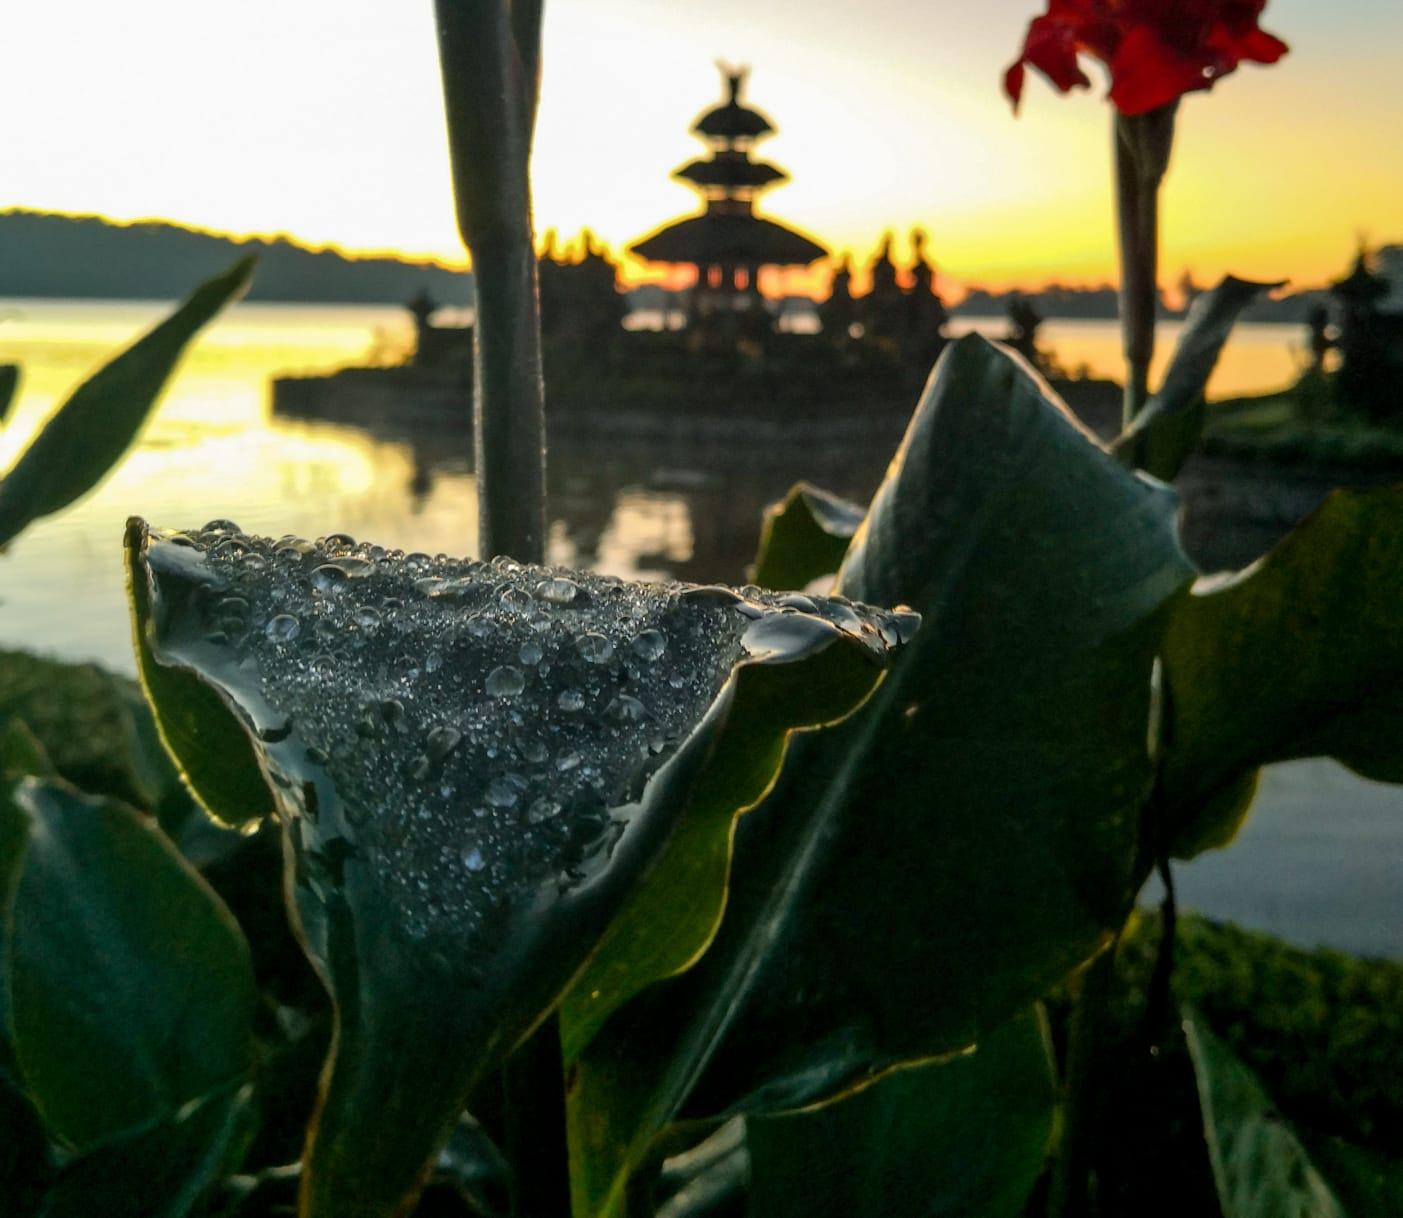 Capturing the sunrise at Ulun Danu Bratan Temple